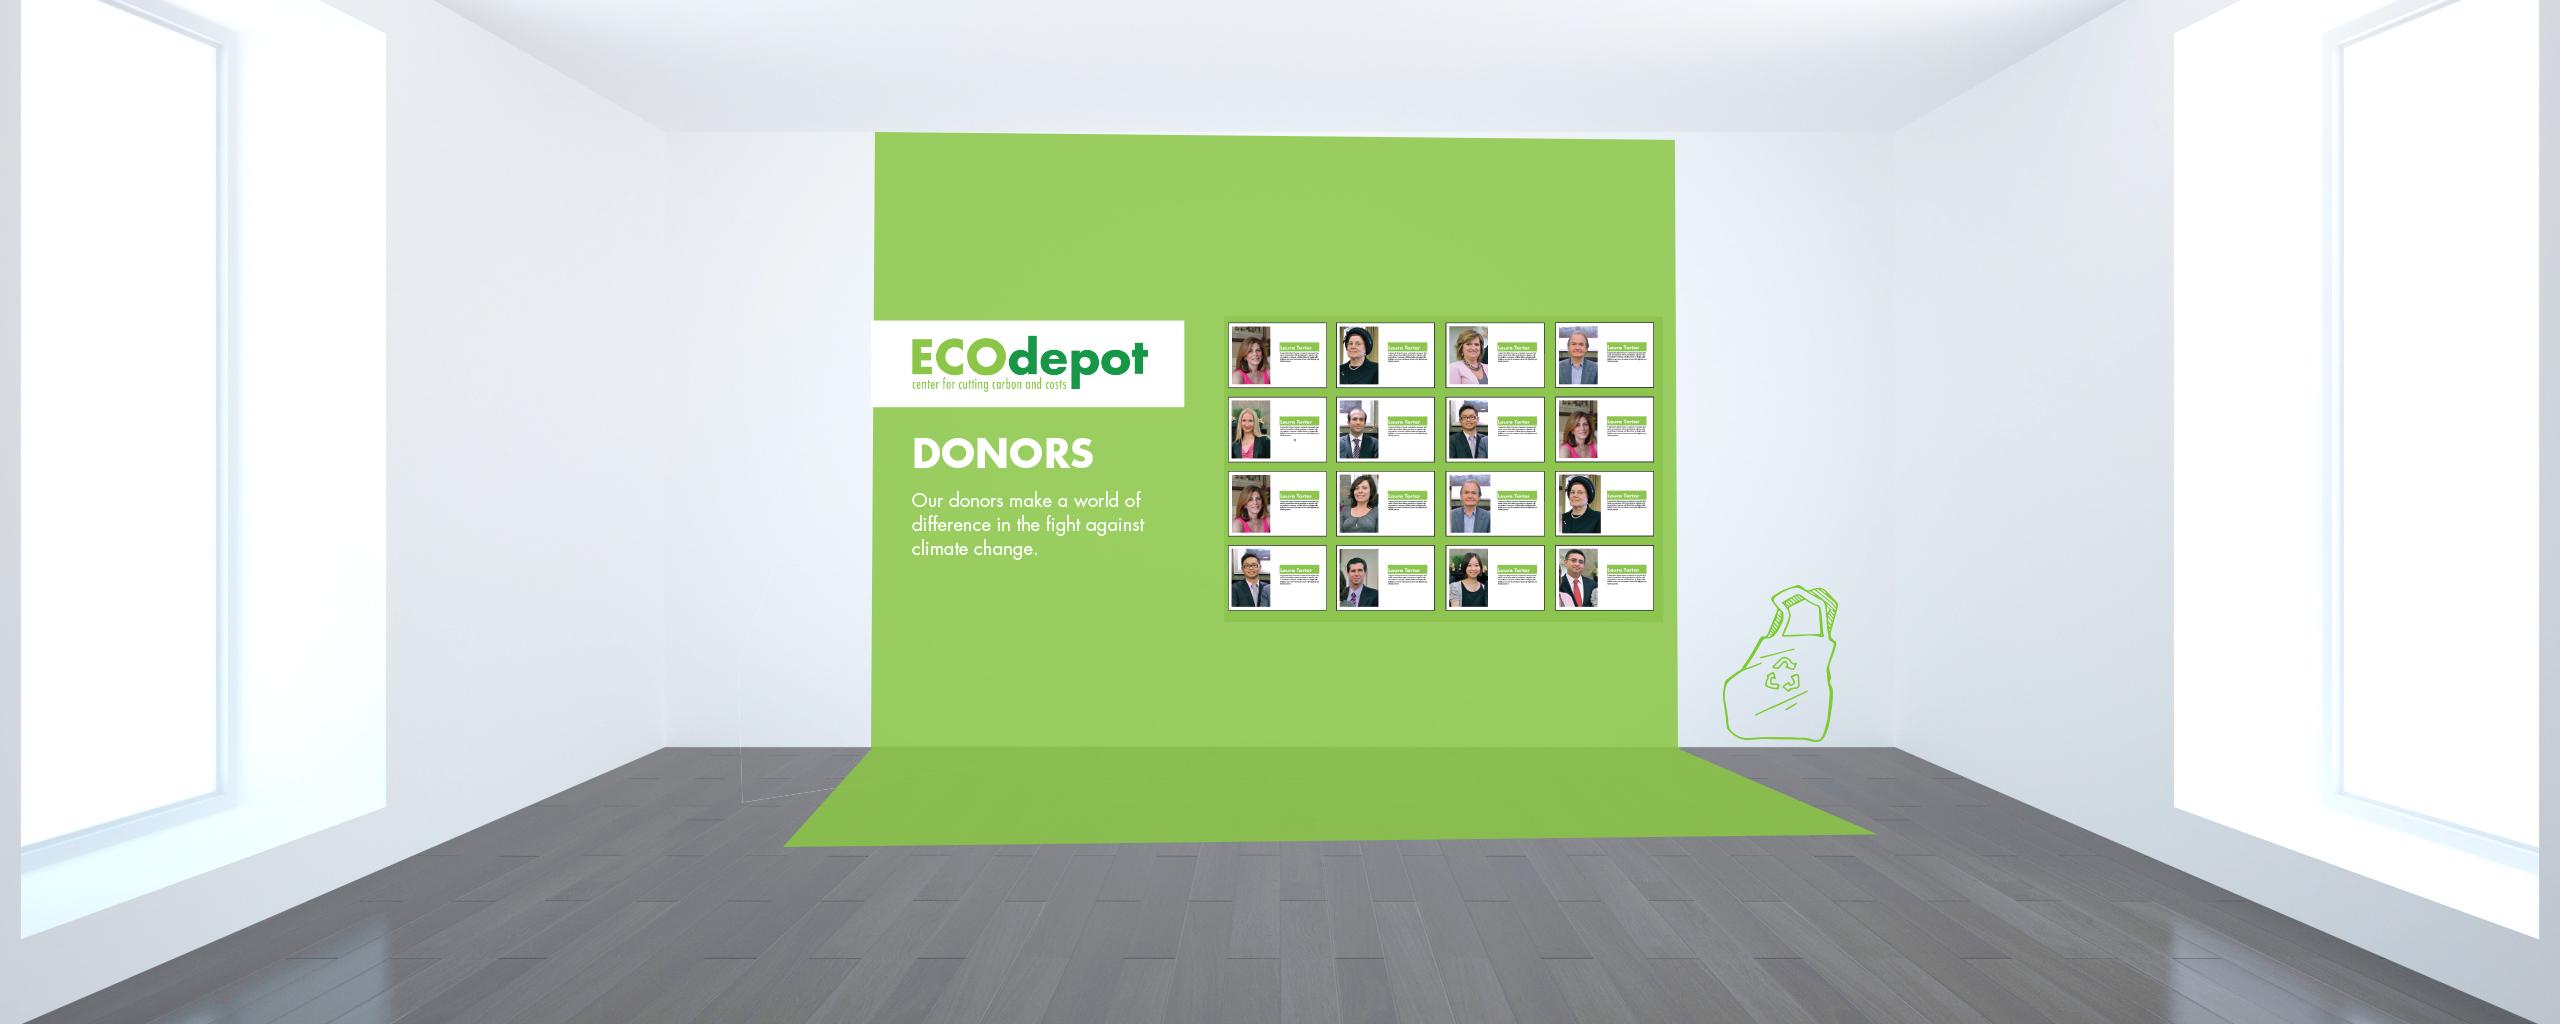 eco depot exhibit- donors